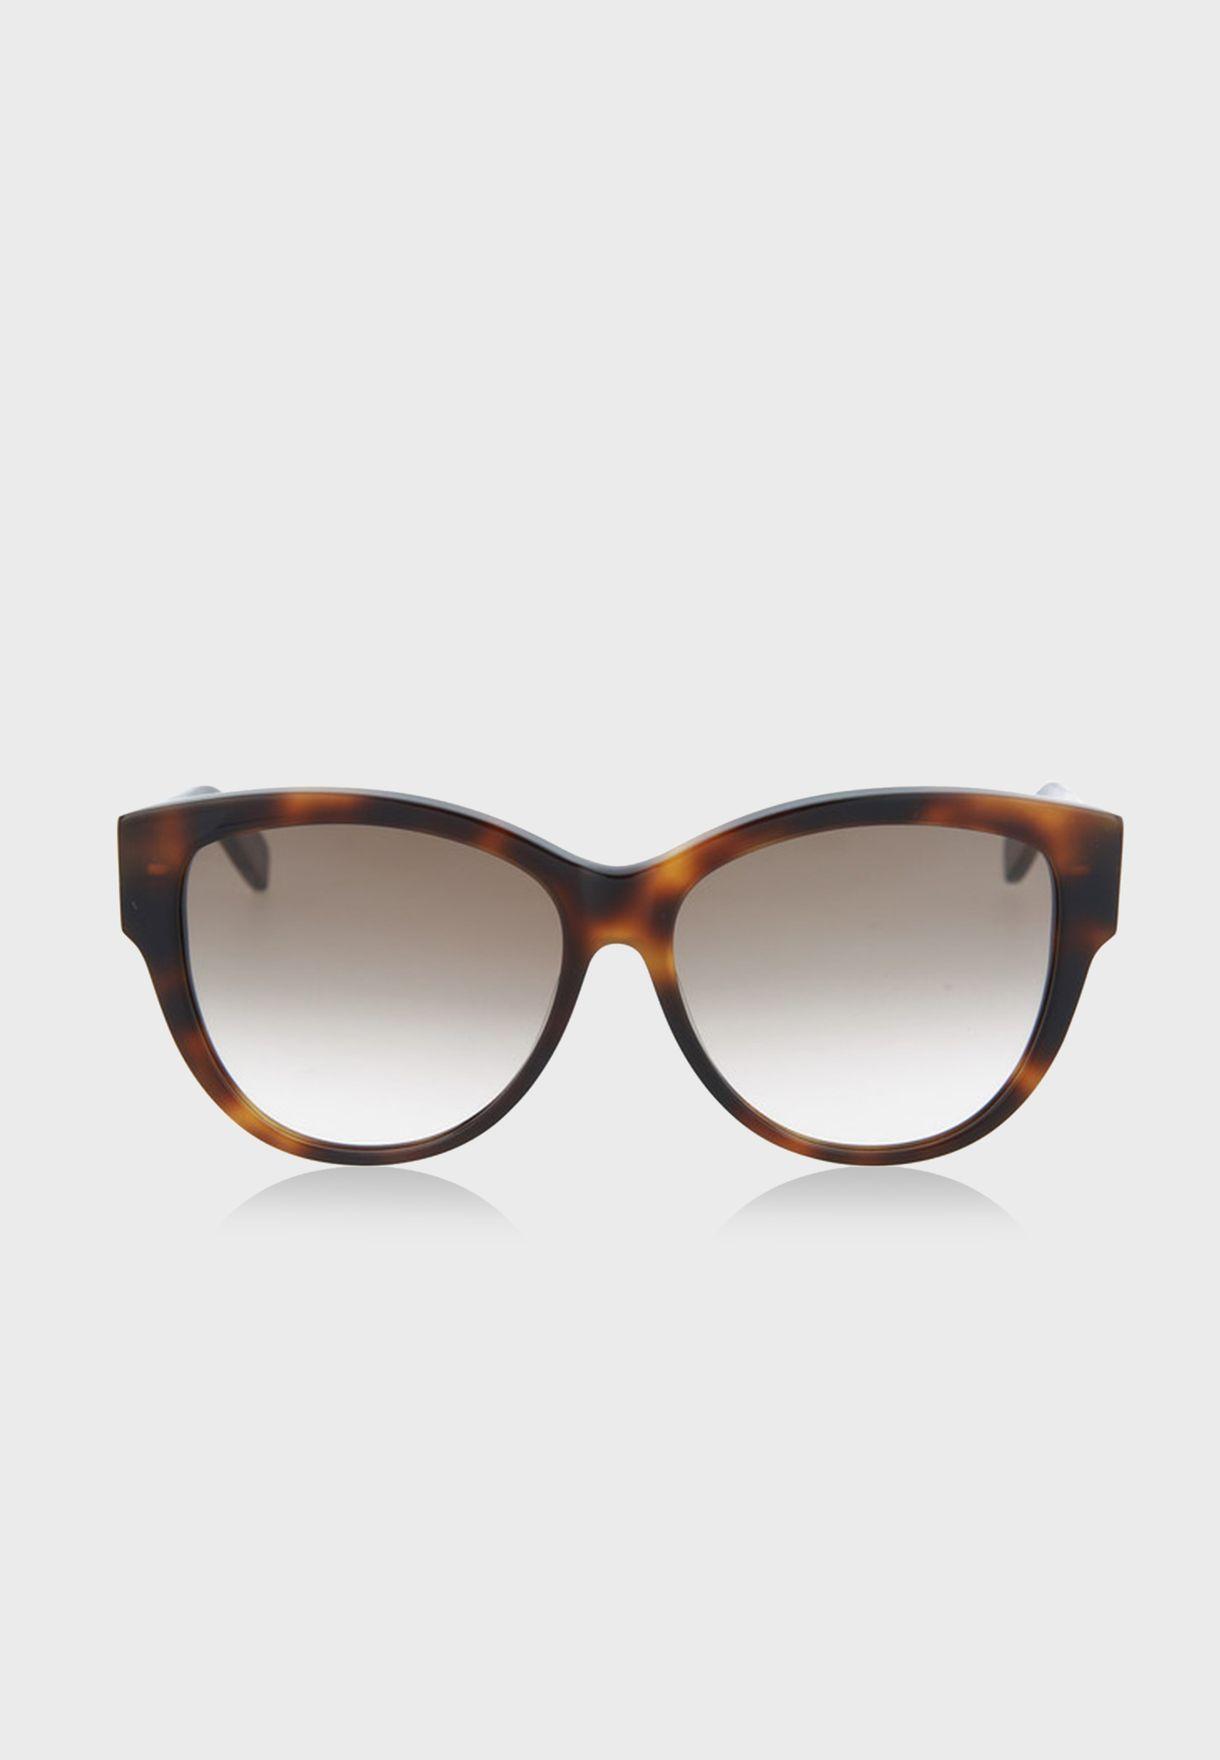 SL162-30001185002 Square Sunglasses